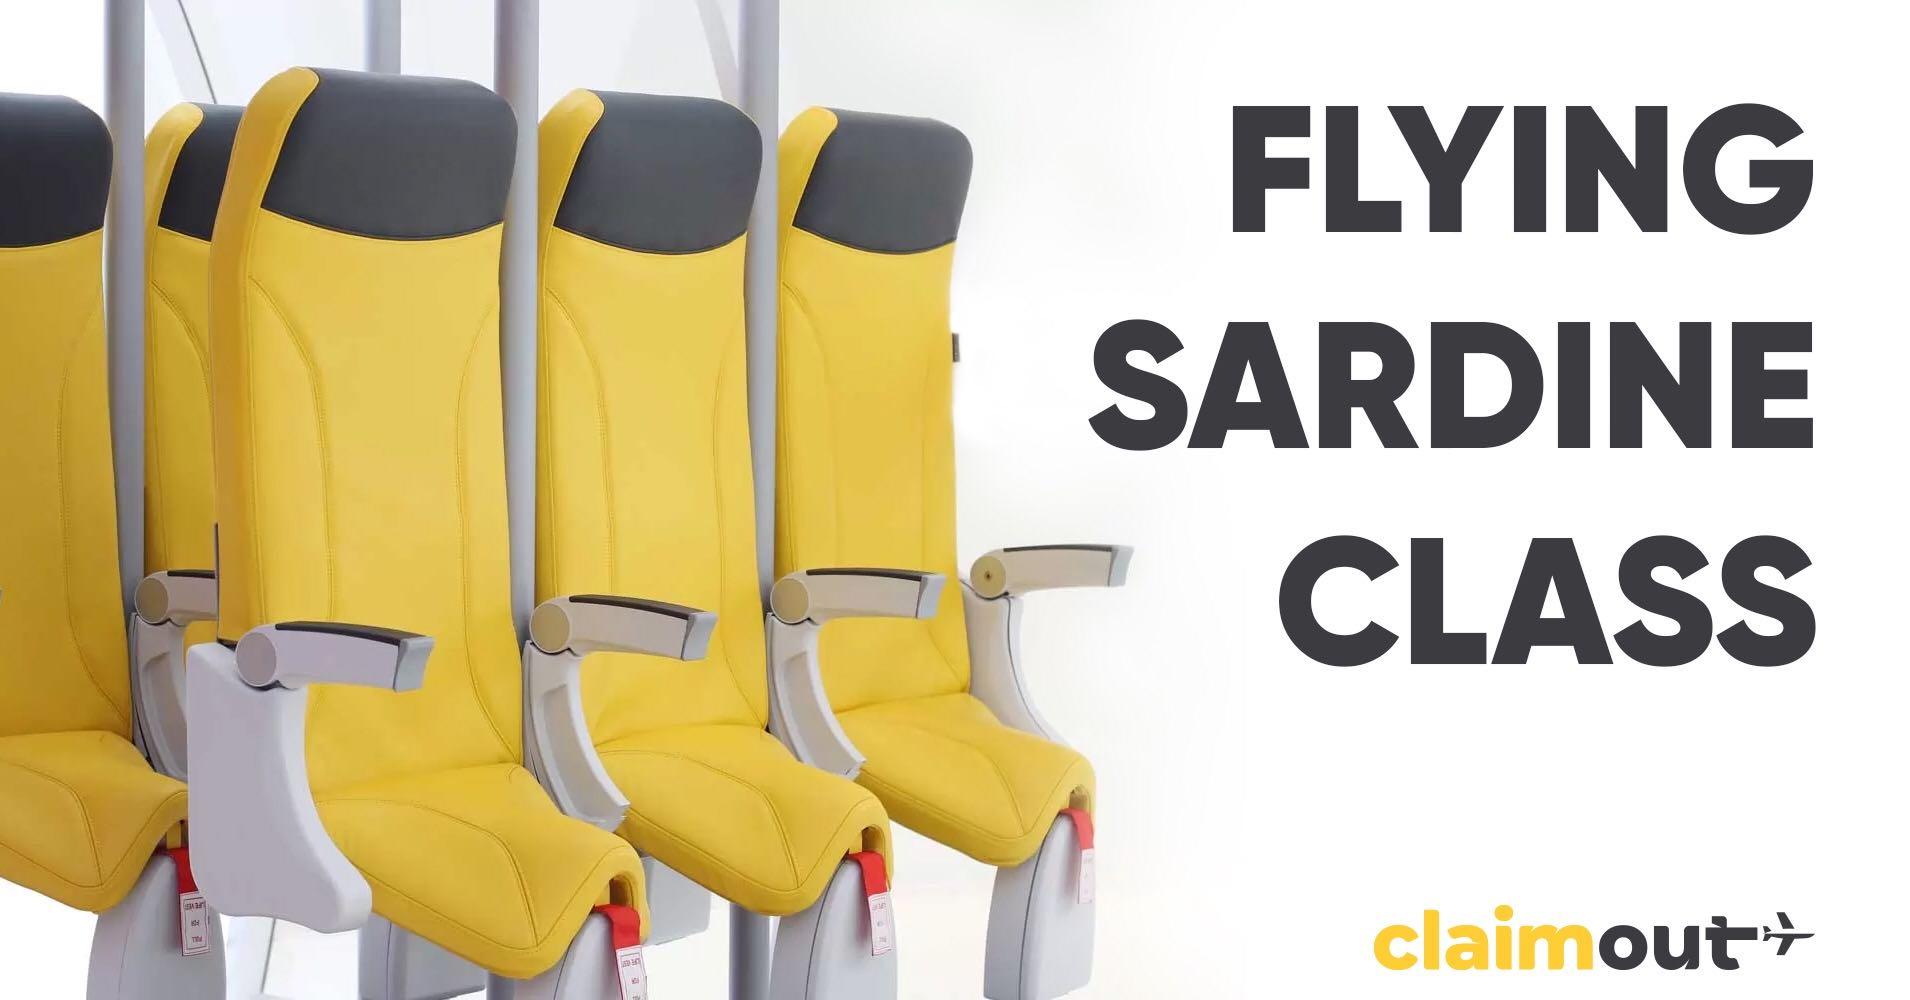 Flying sardine class